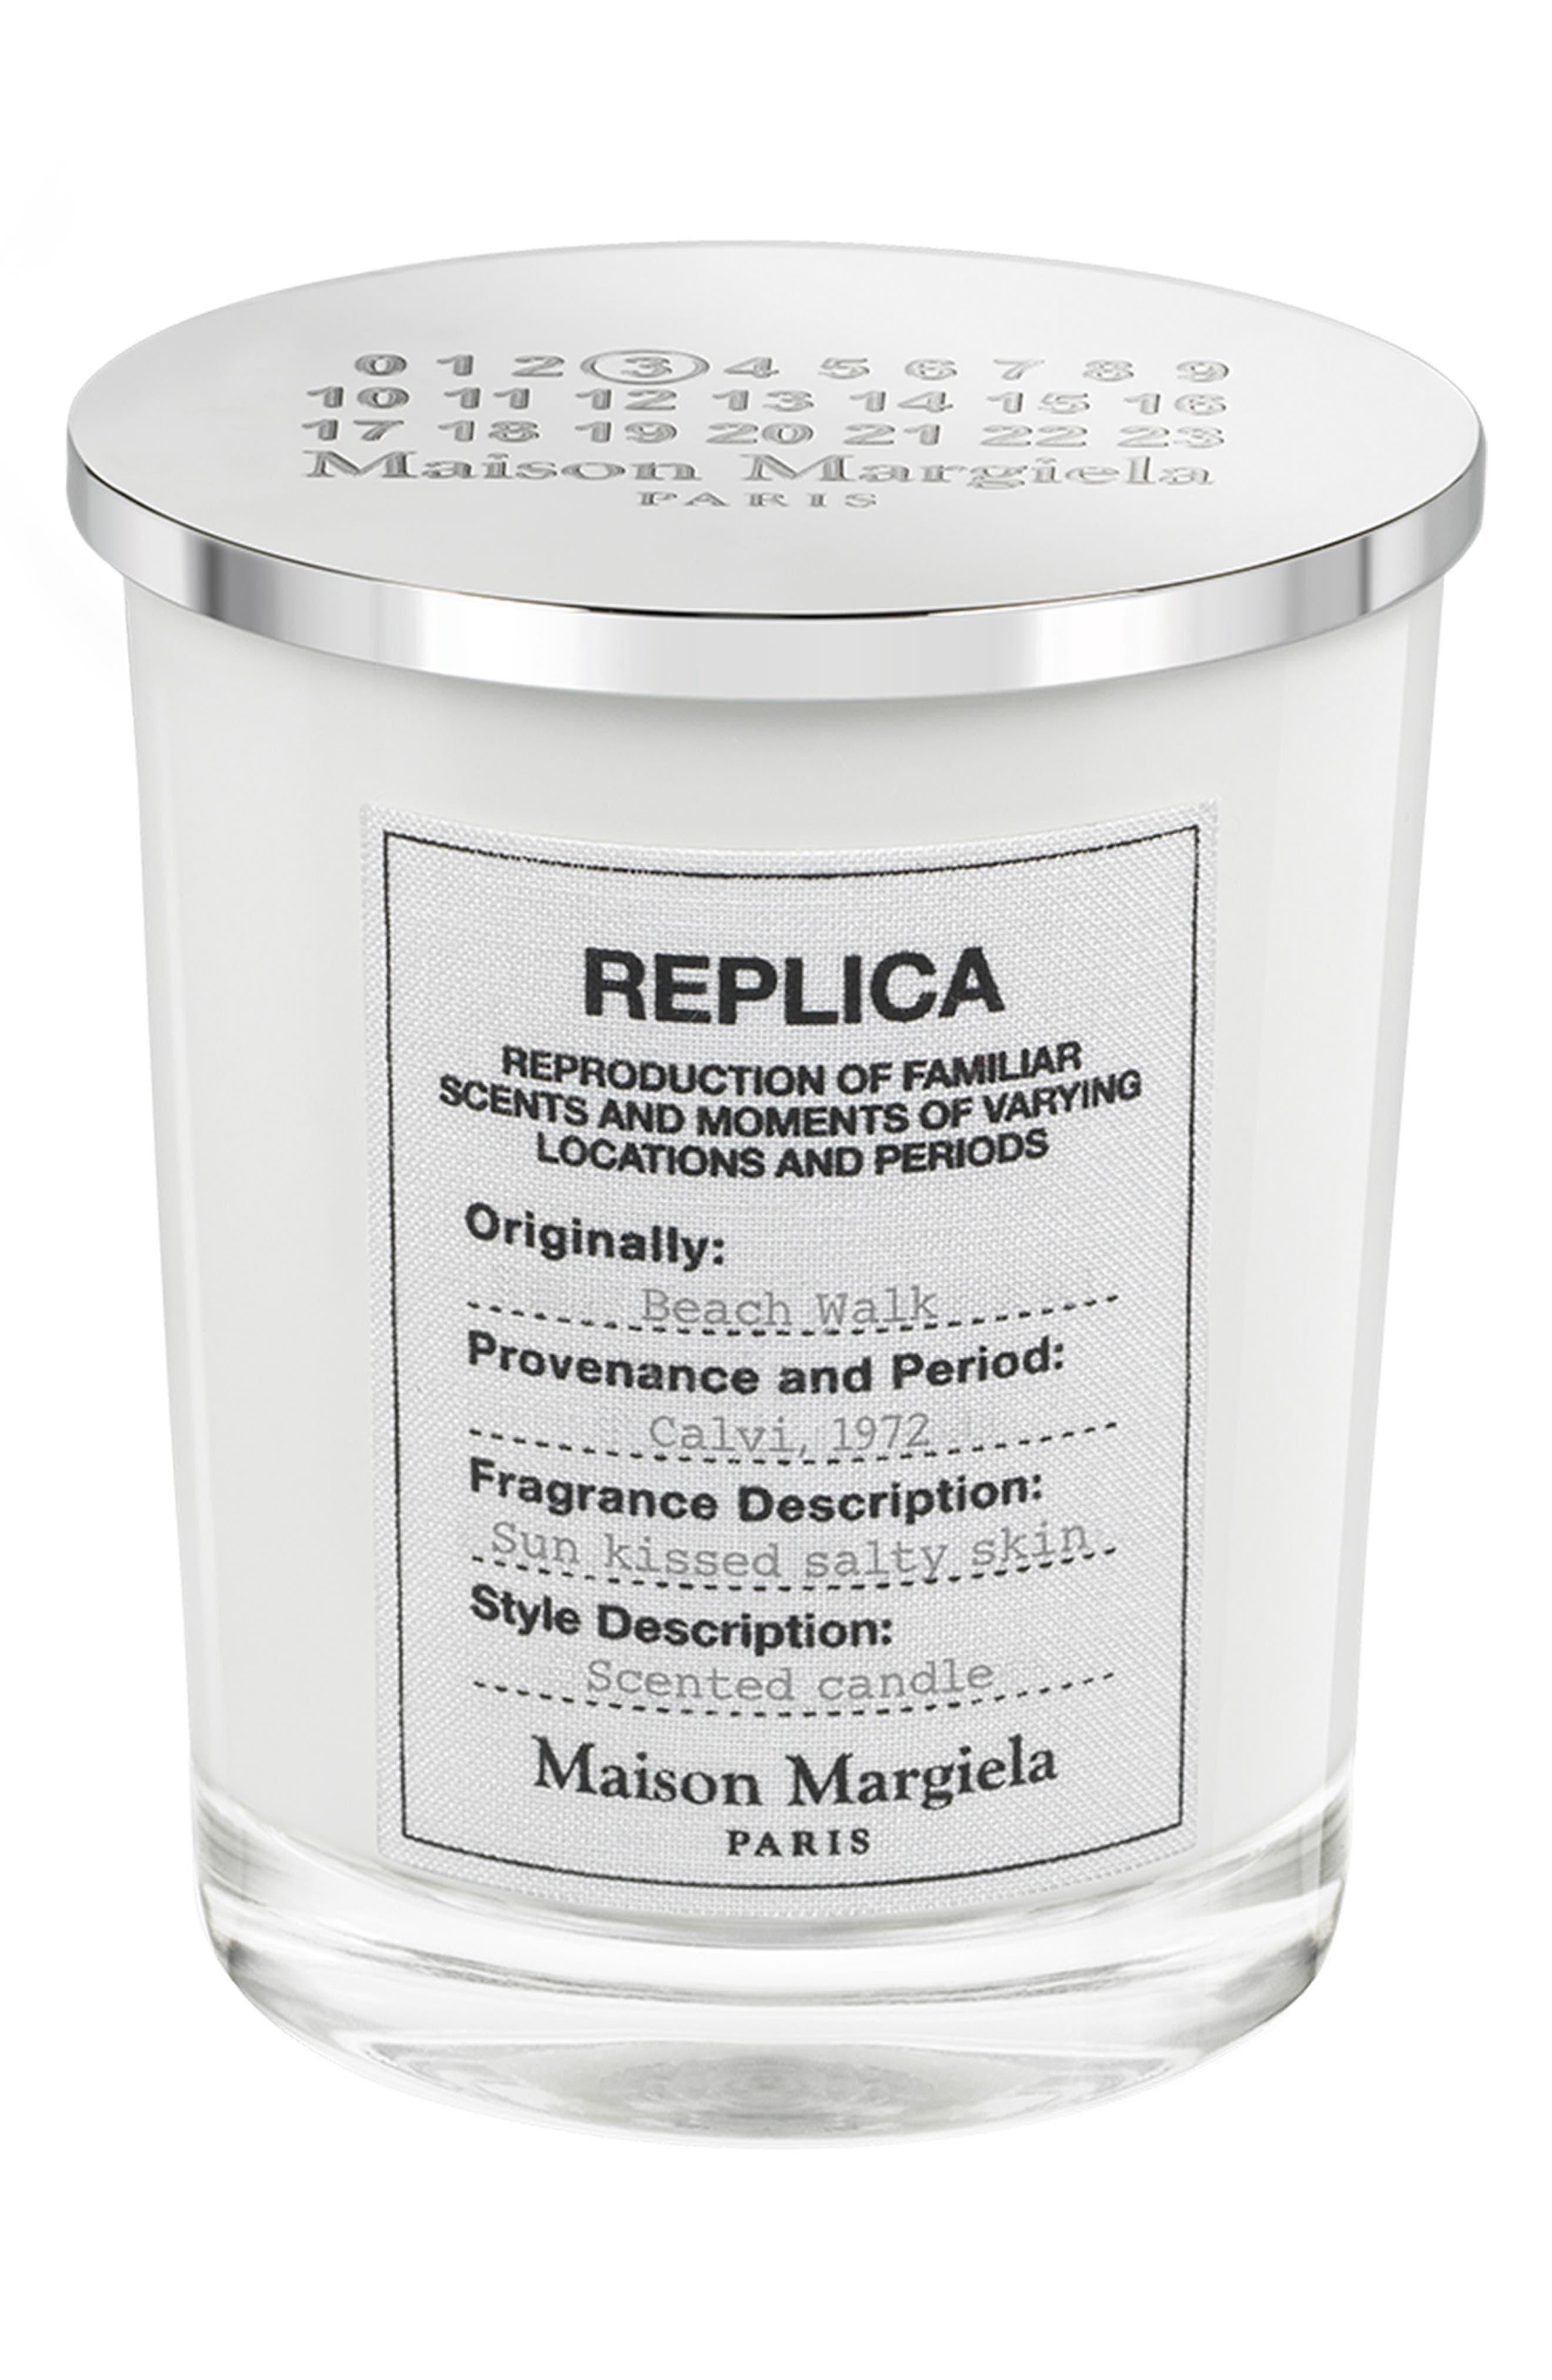 Replica Beach Walk Scented Candle,                         Main,                         color, 000